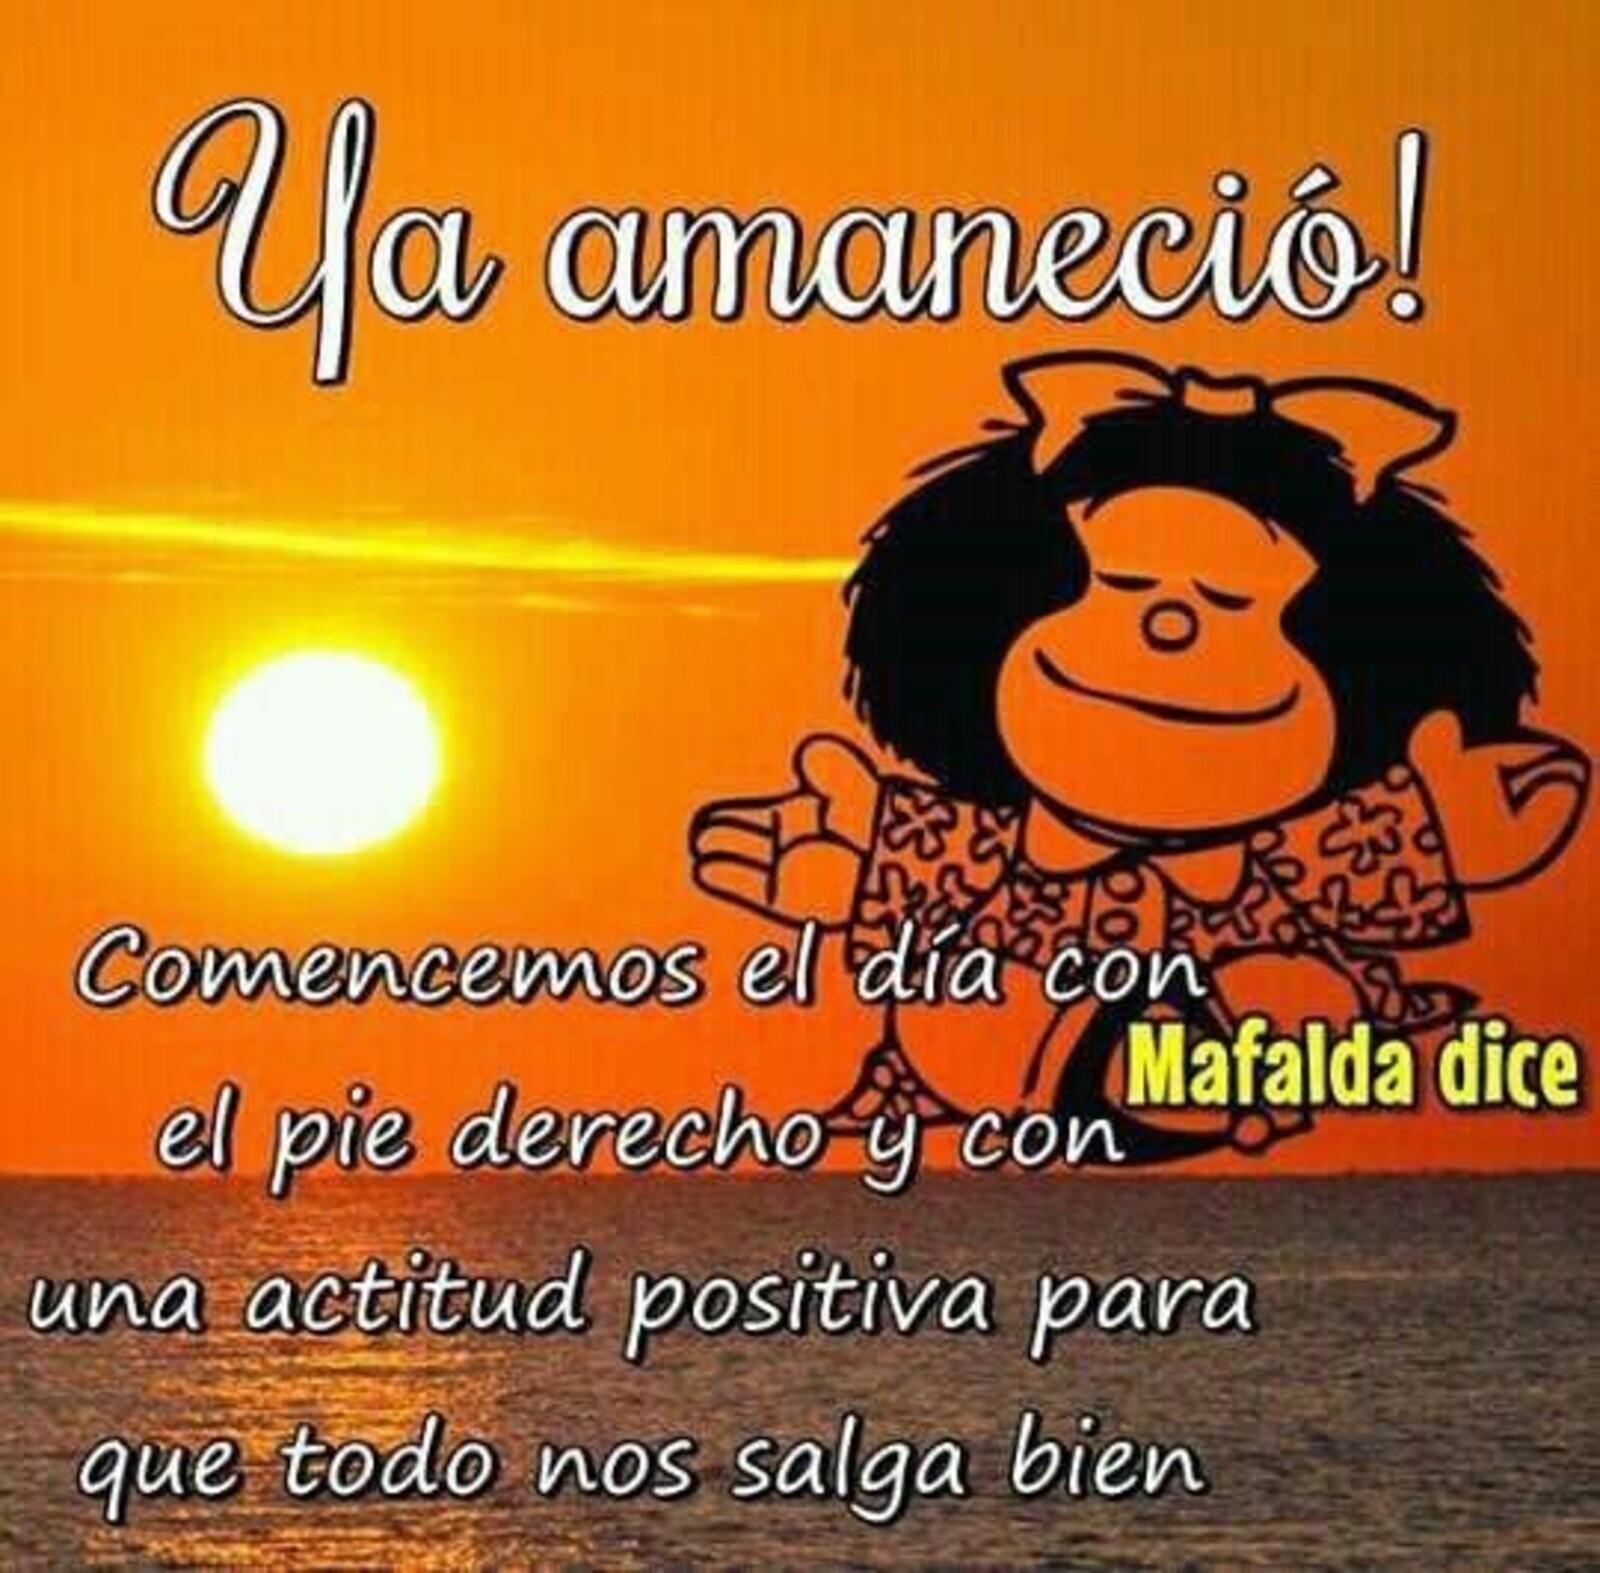 ya amaneció! - Mafalda